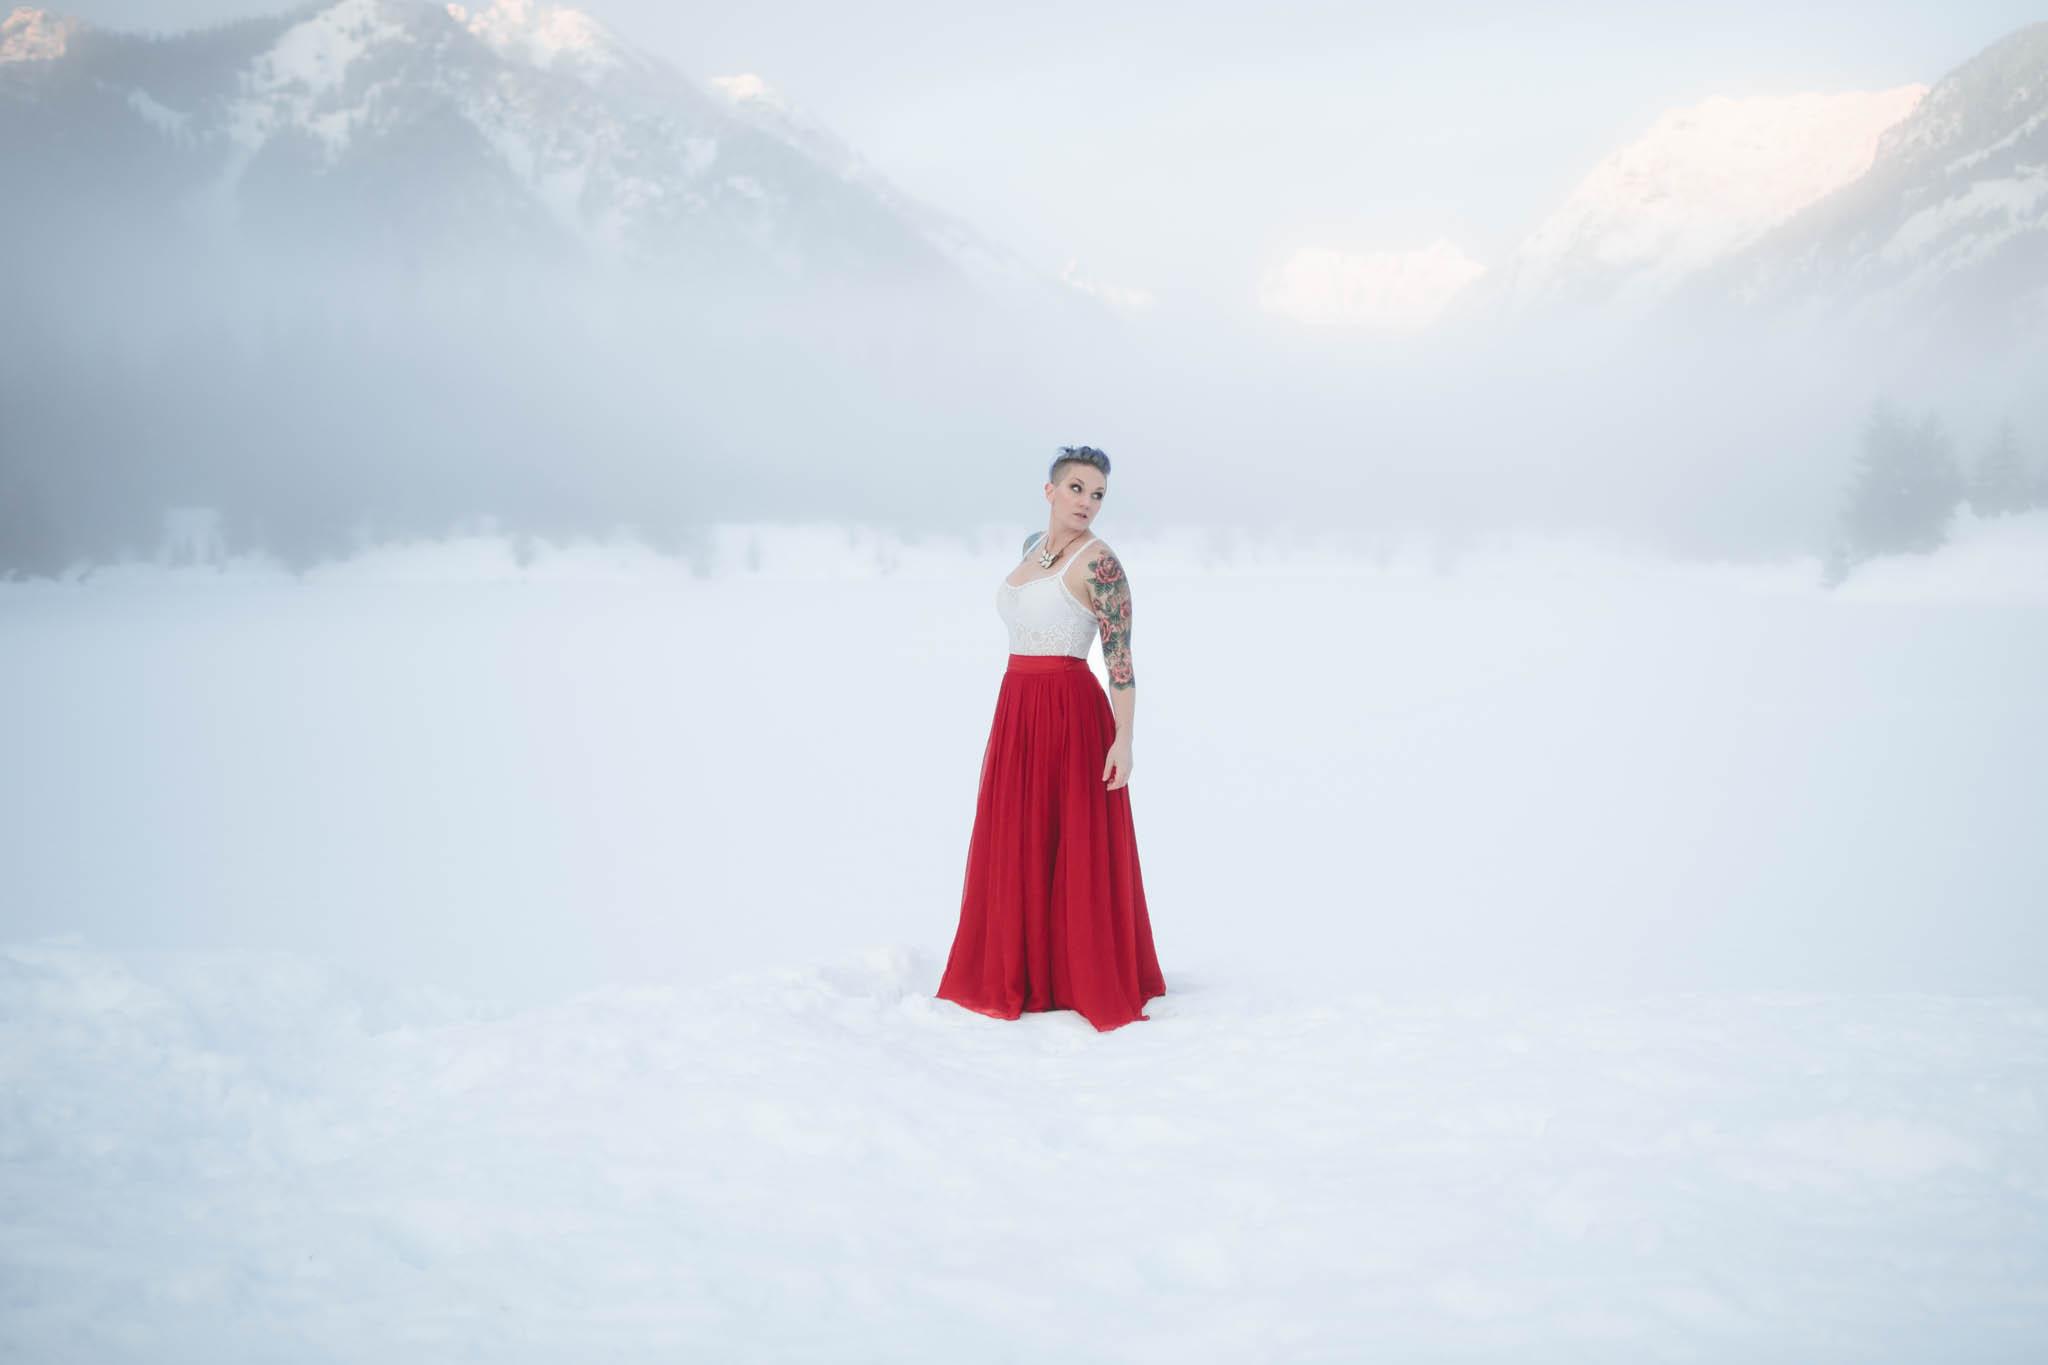 2016-1 Shan snow Web-18.jpg